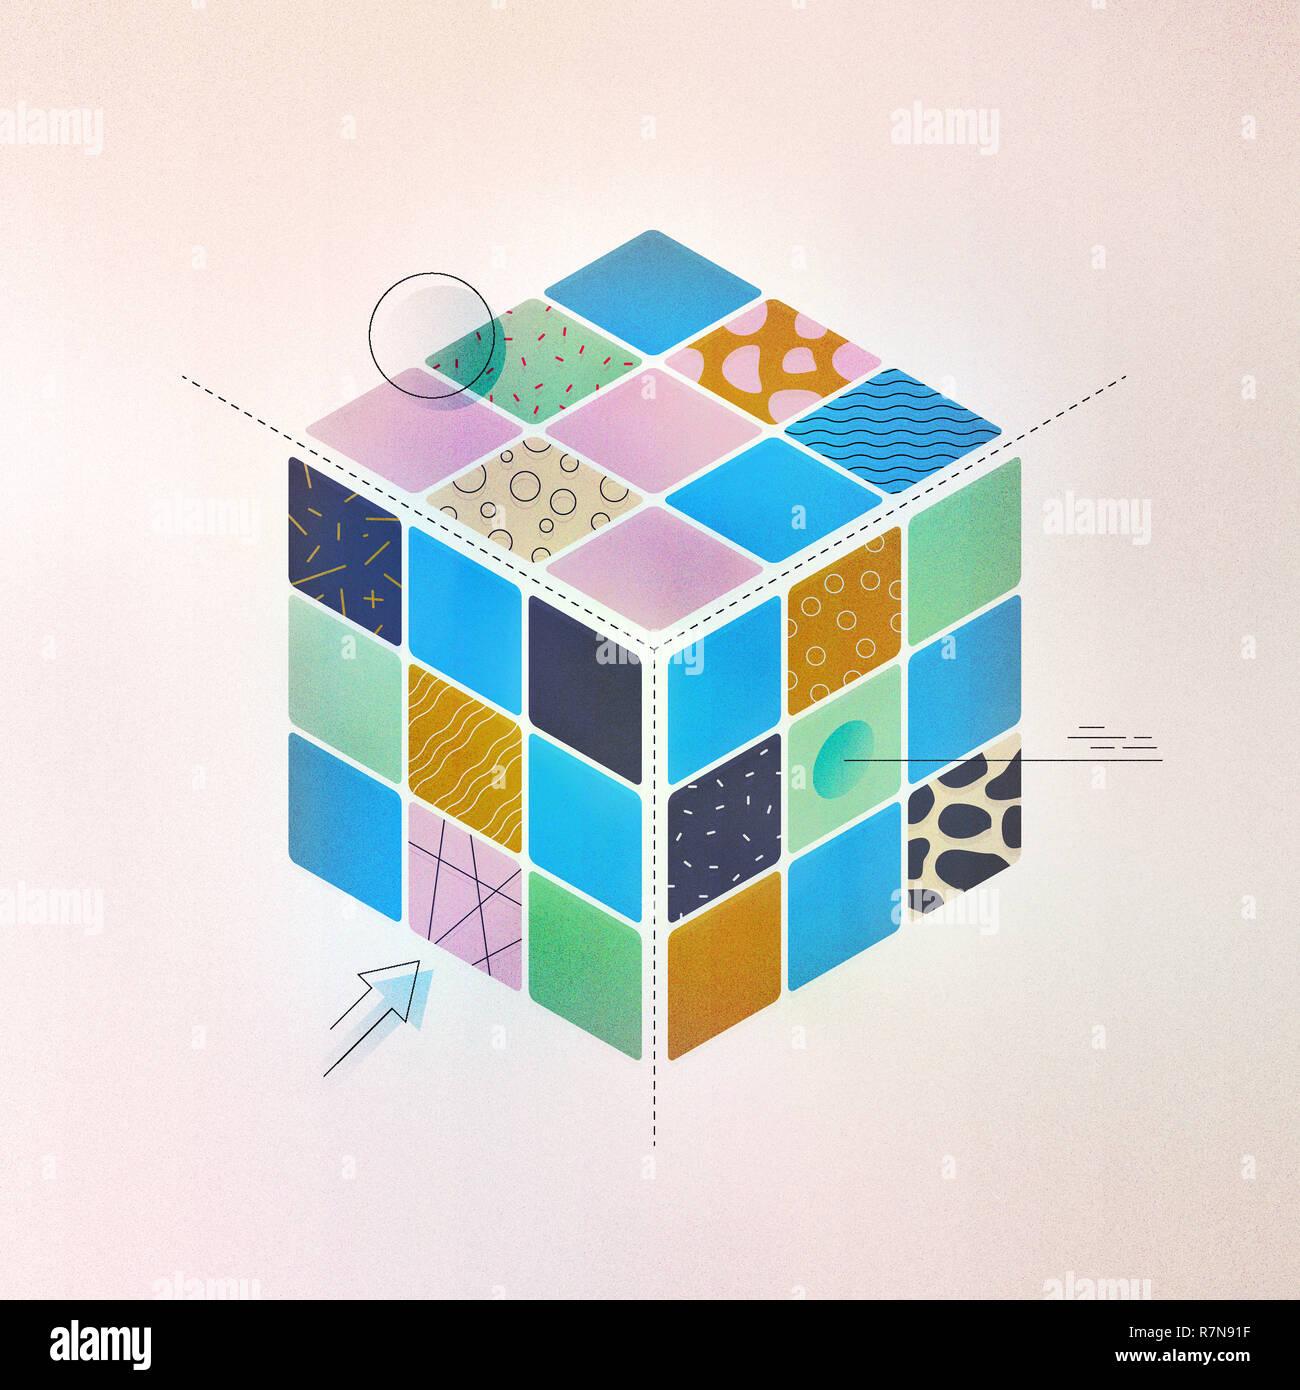 Design genom System, Team Organisationsstruktur, Produktentwicklung, Marke Ecosystems Lösung. Stockfoto